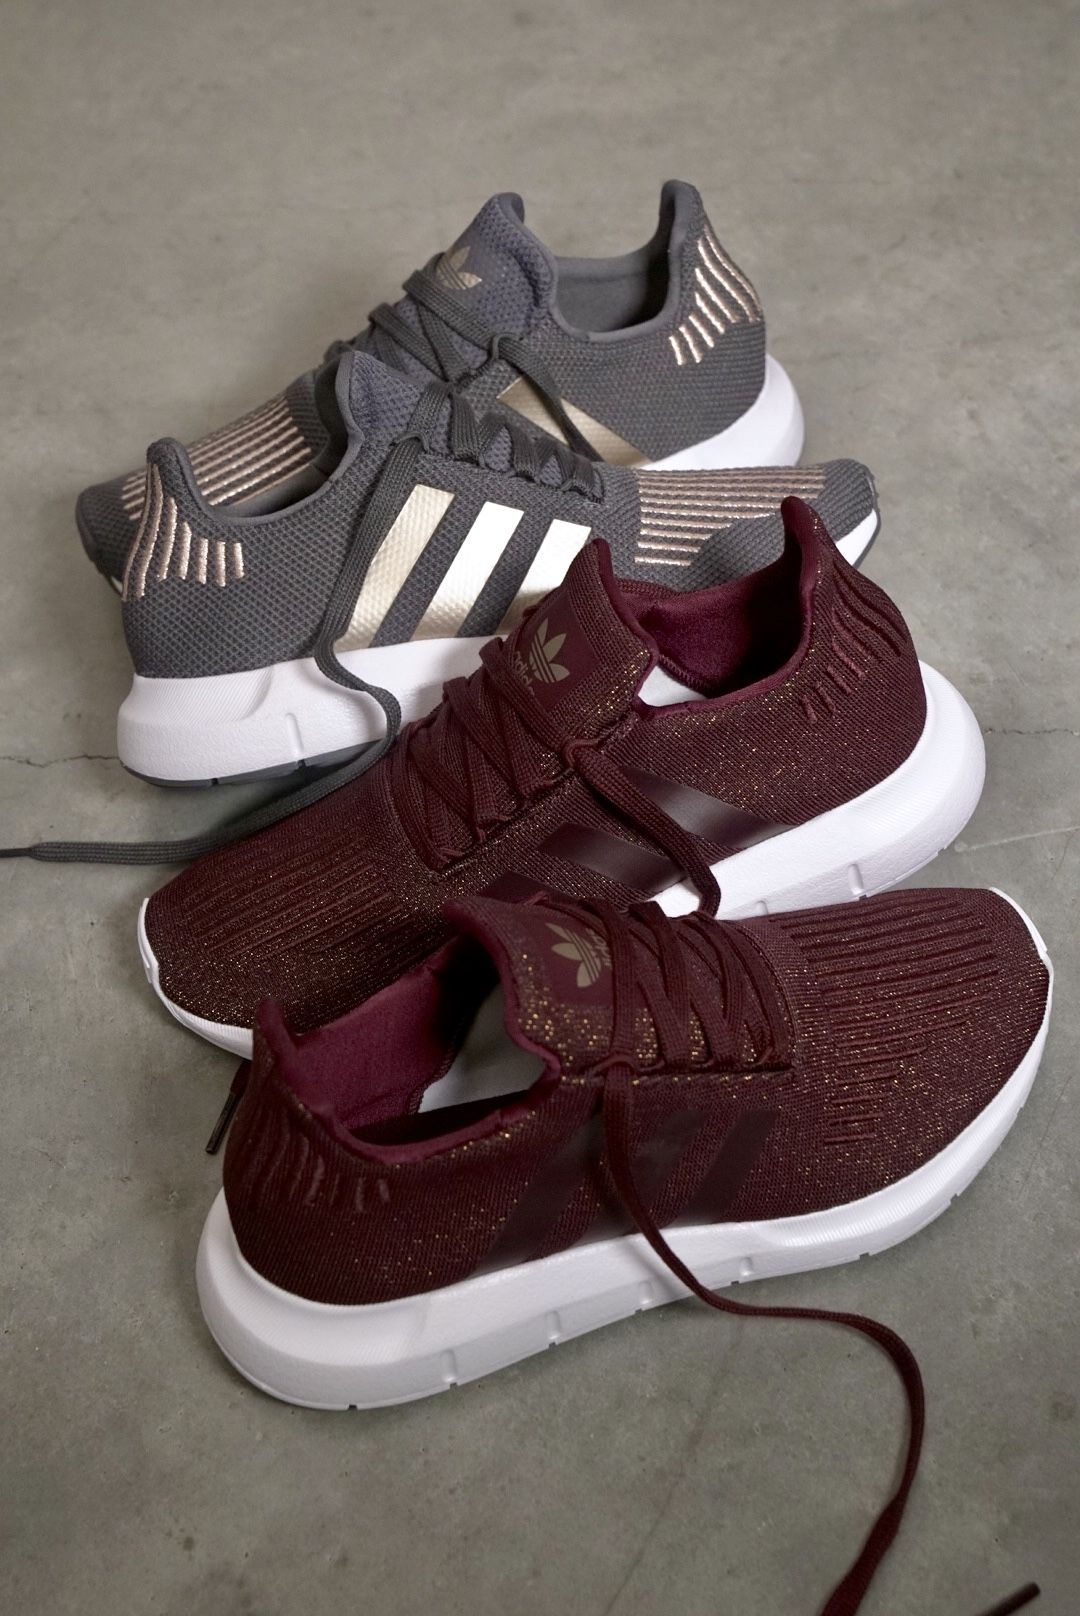 Adidas Swifts Tenis Adidas 7a1f3330147